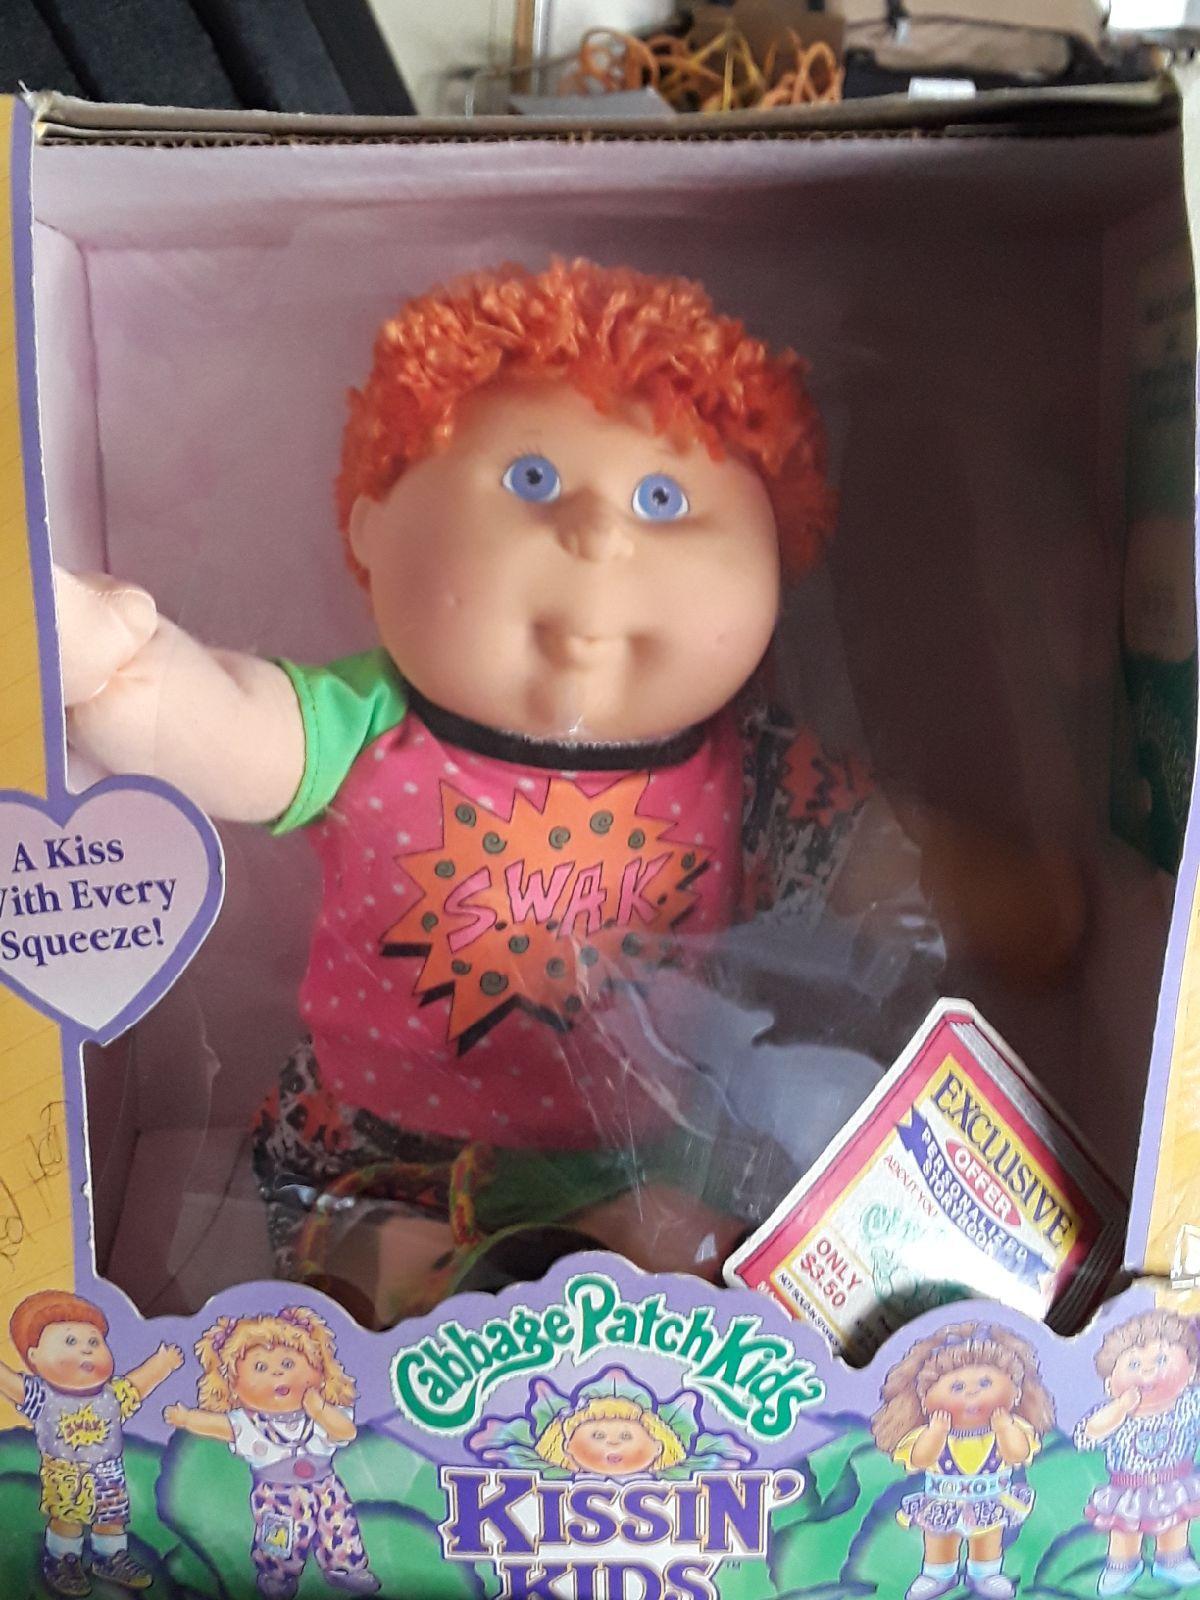 Hasbro Cabbage Patch Kids Vintage Doll Kissing Kids Kissin Kids Boy Red Hair Fully Dressed Cabbage Patch Kids Cabbage Patch Dolls Cabbage Patch Kids Dolls